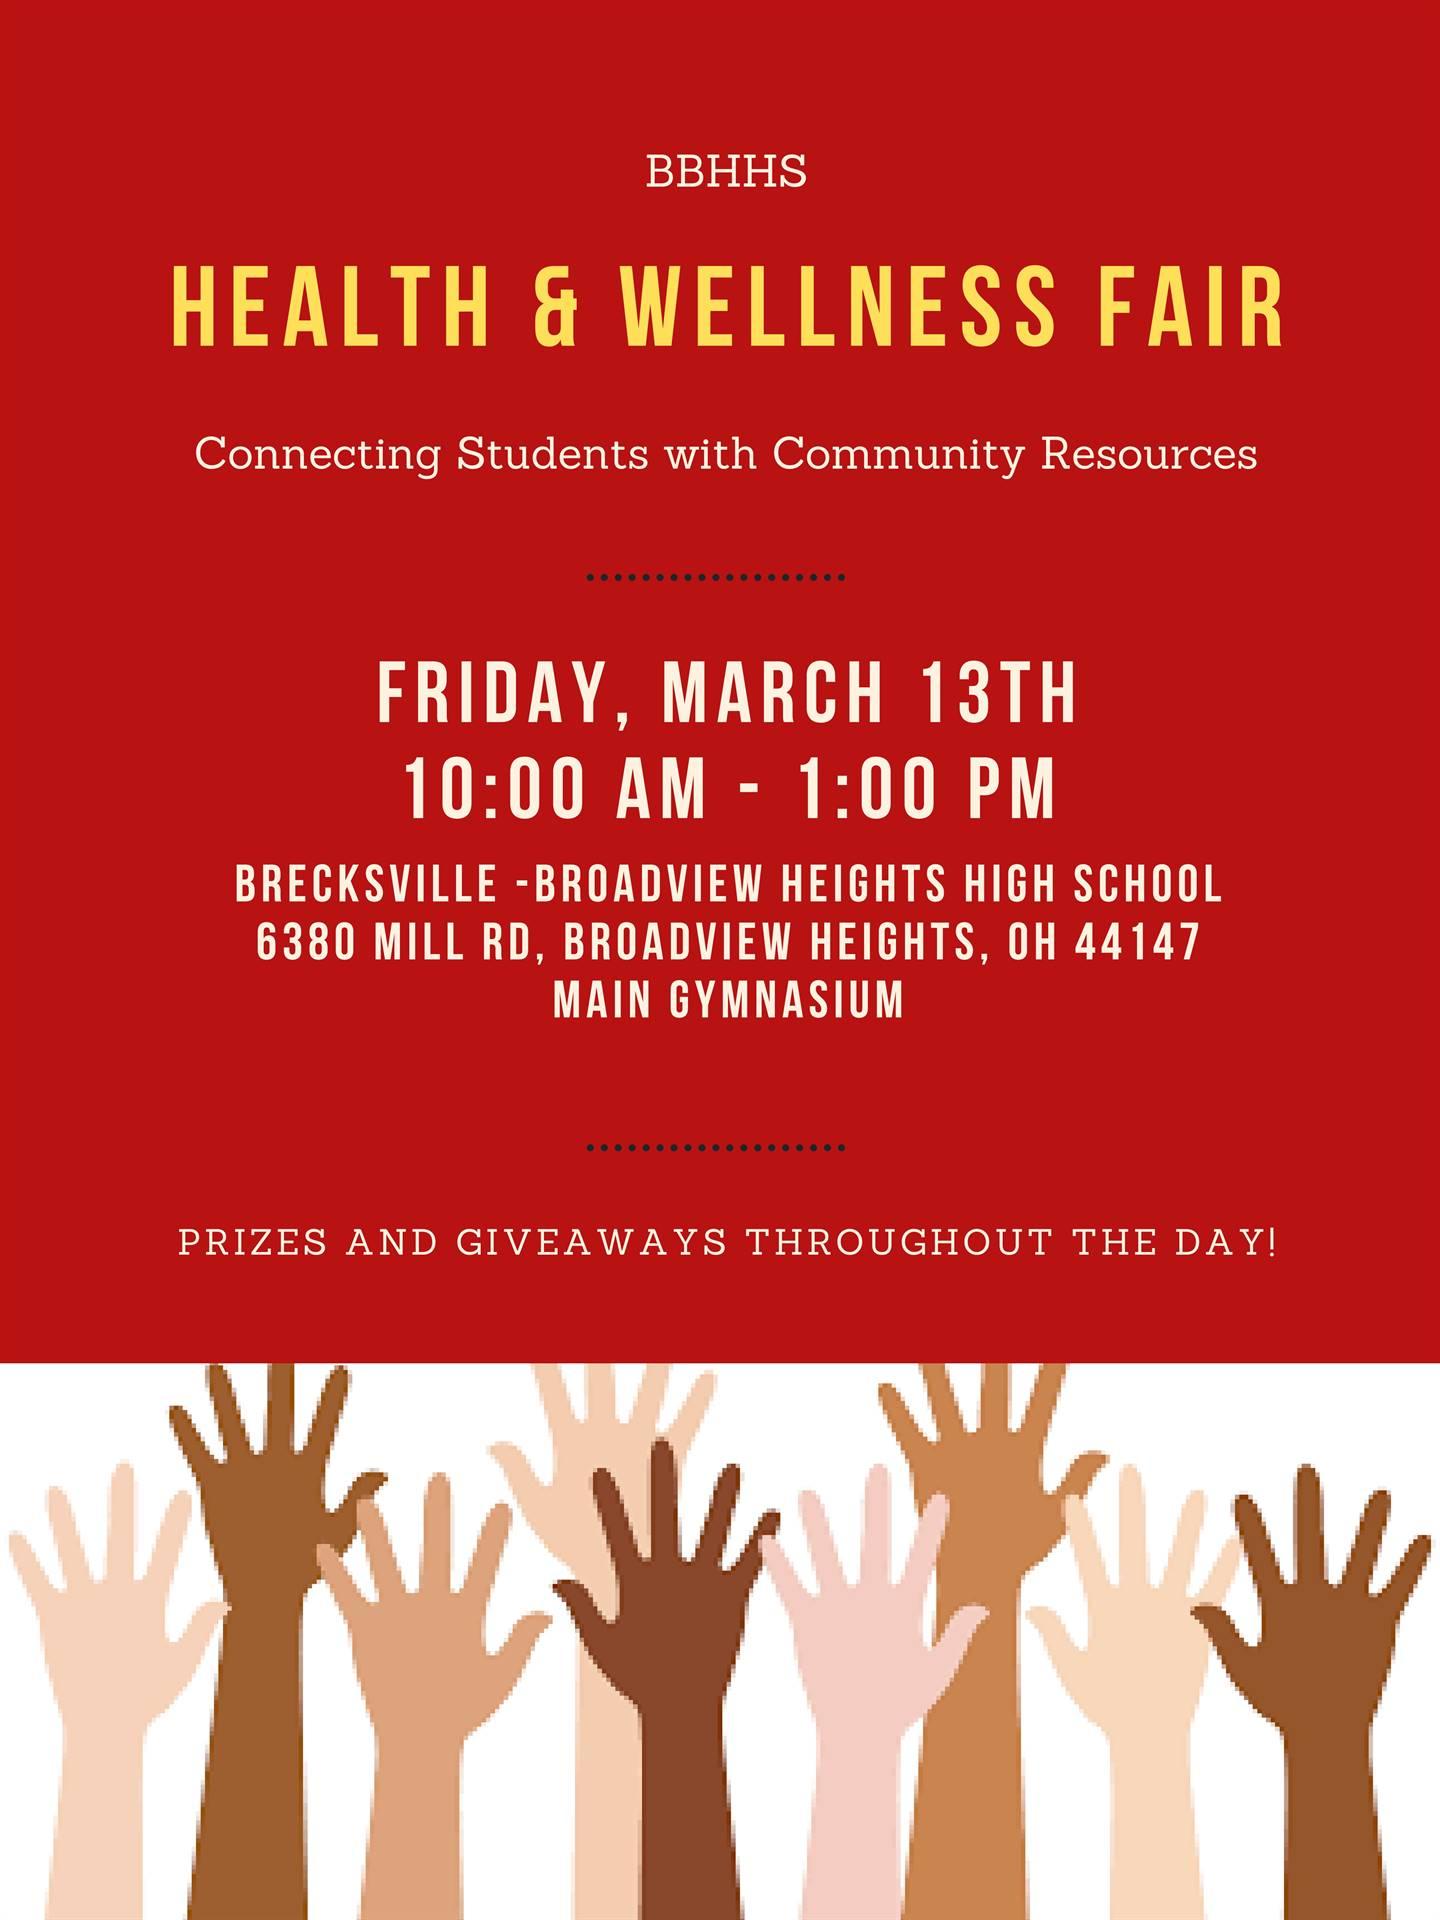 Health and Wellness Fair March 13th